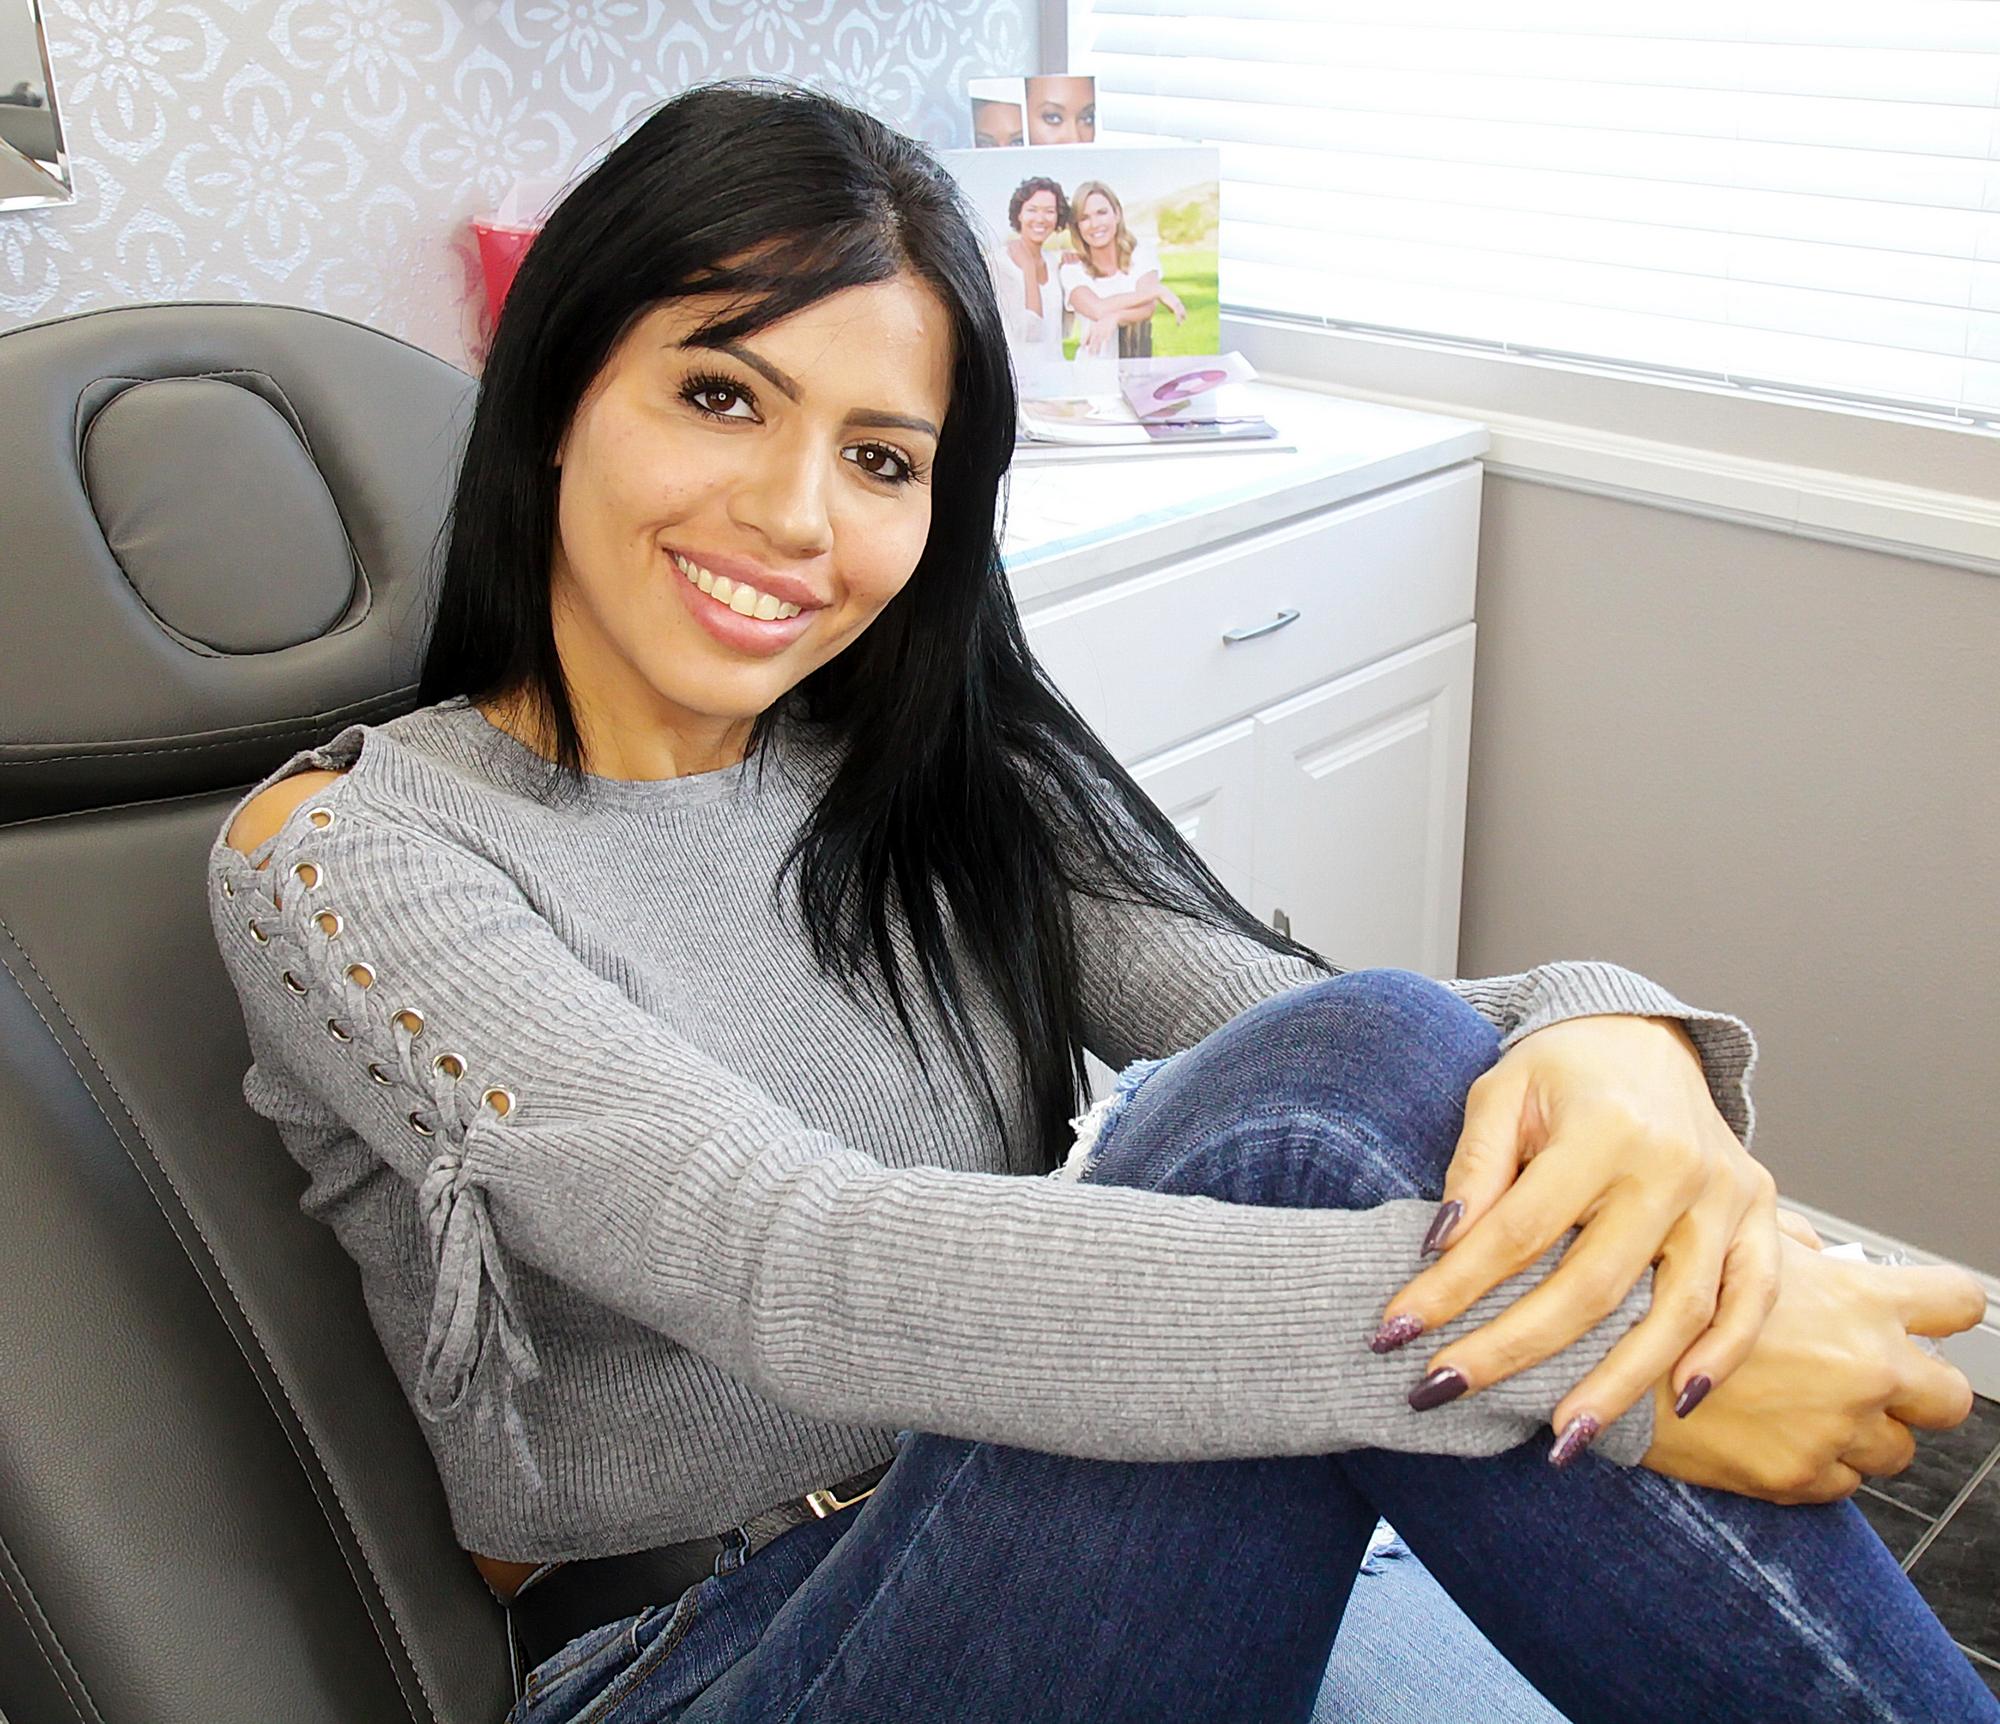 Larissa-Dos-Santos-Lima-addicted-to-plastic-surgery